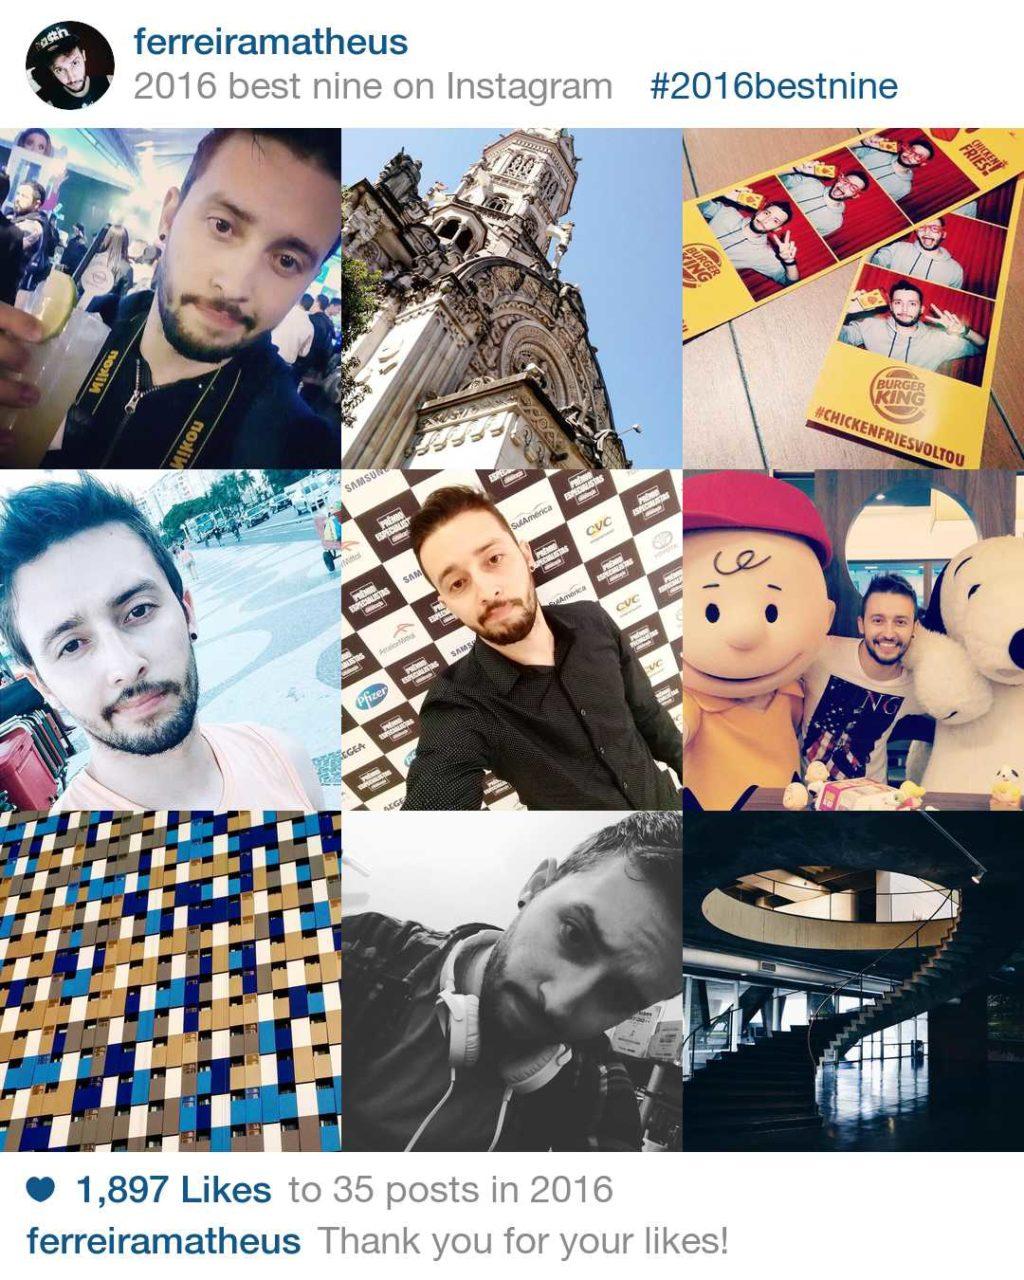 2016bestnine-retrospectiva-instagram-matheus-ferreira